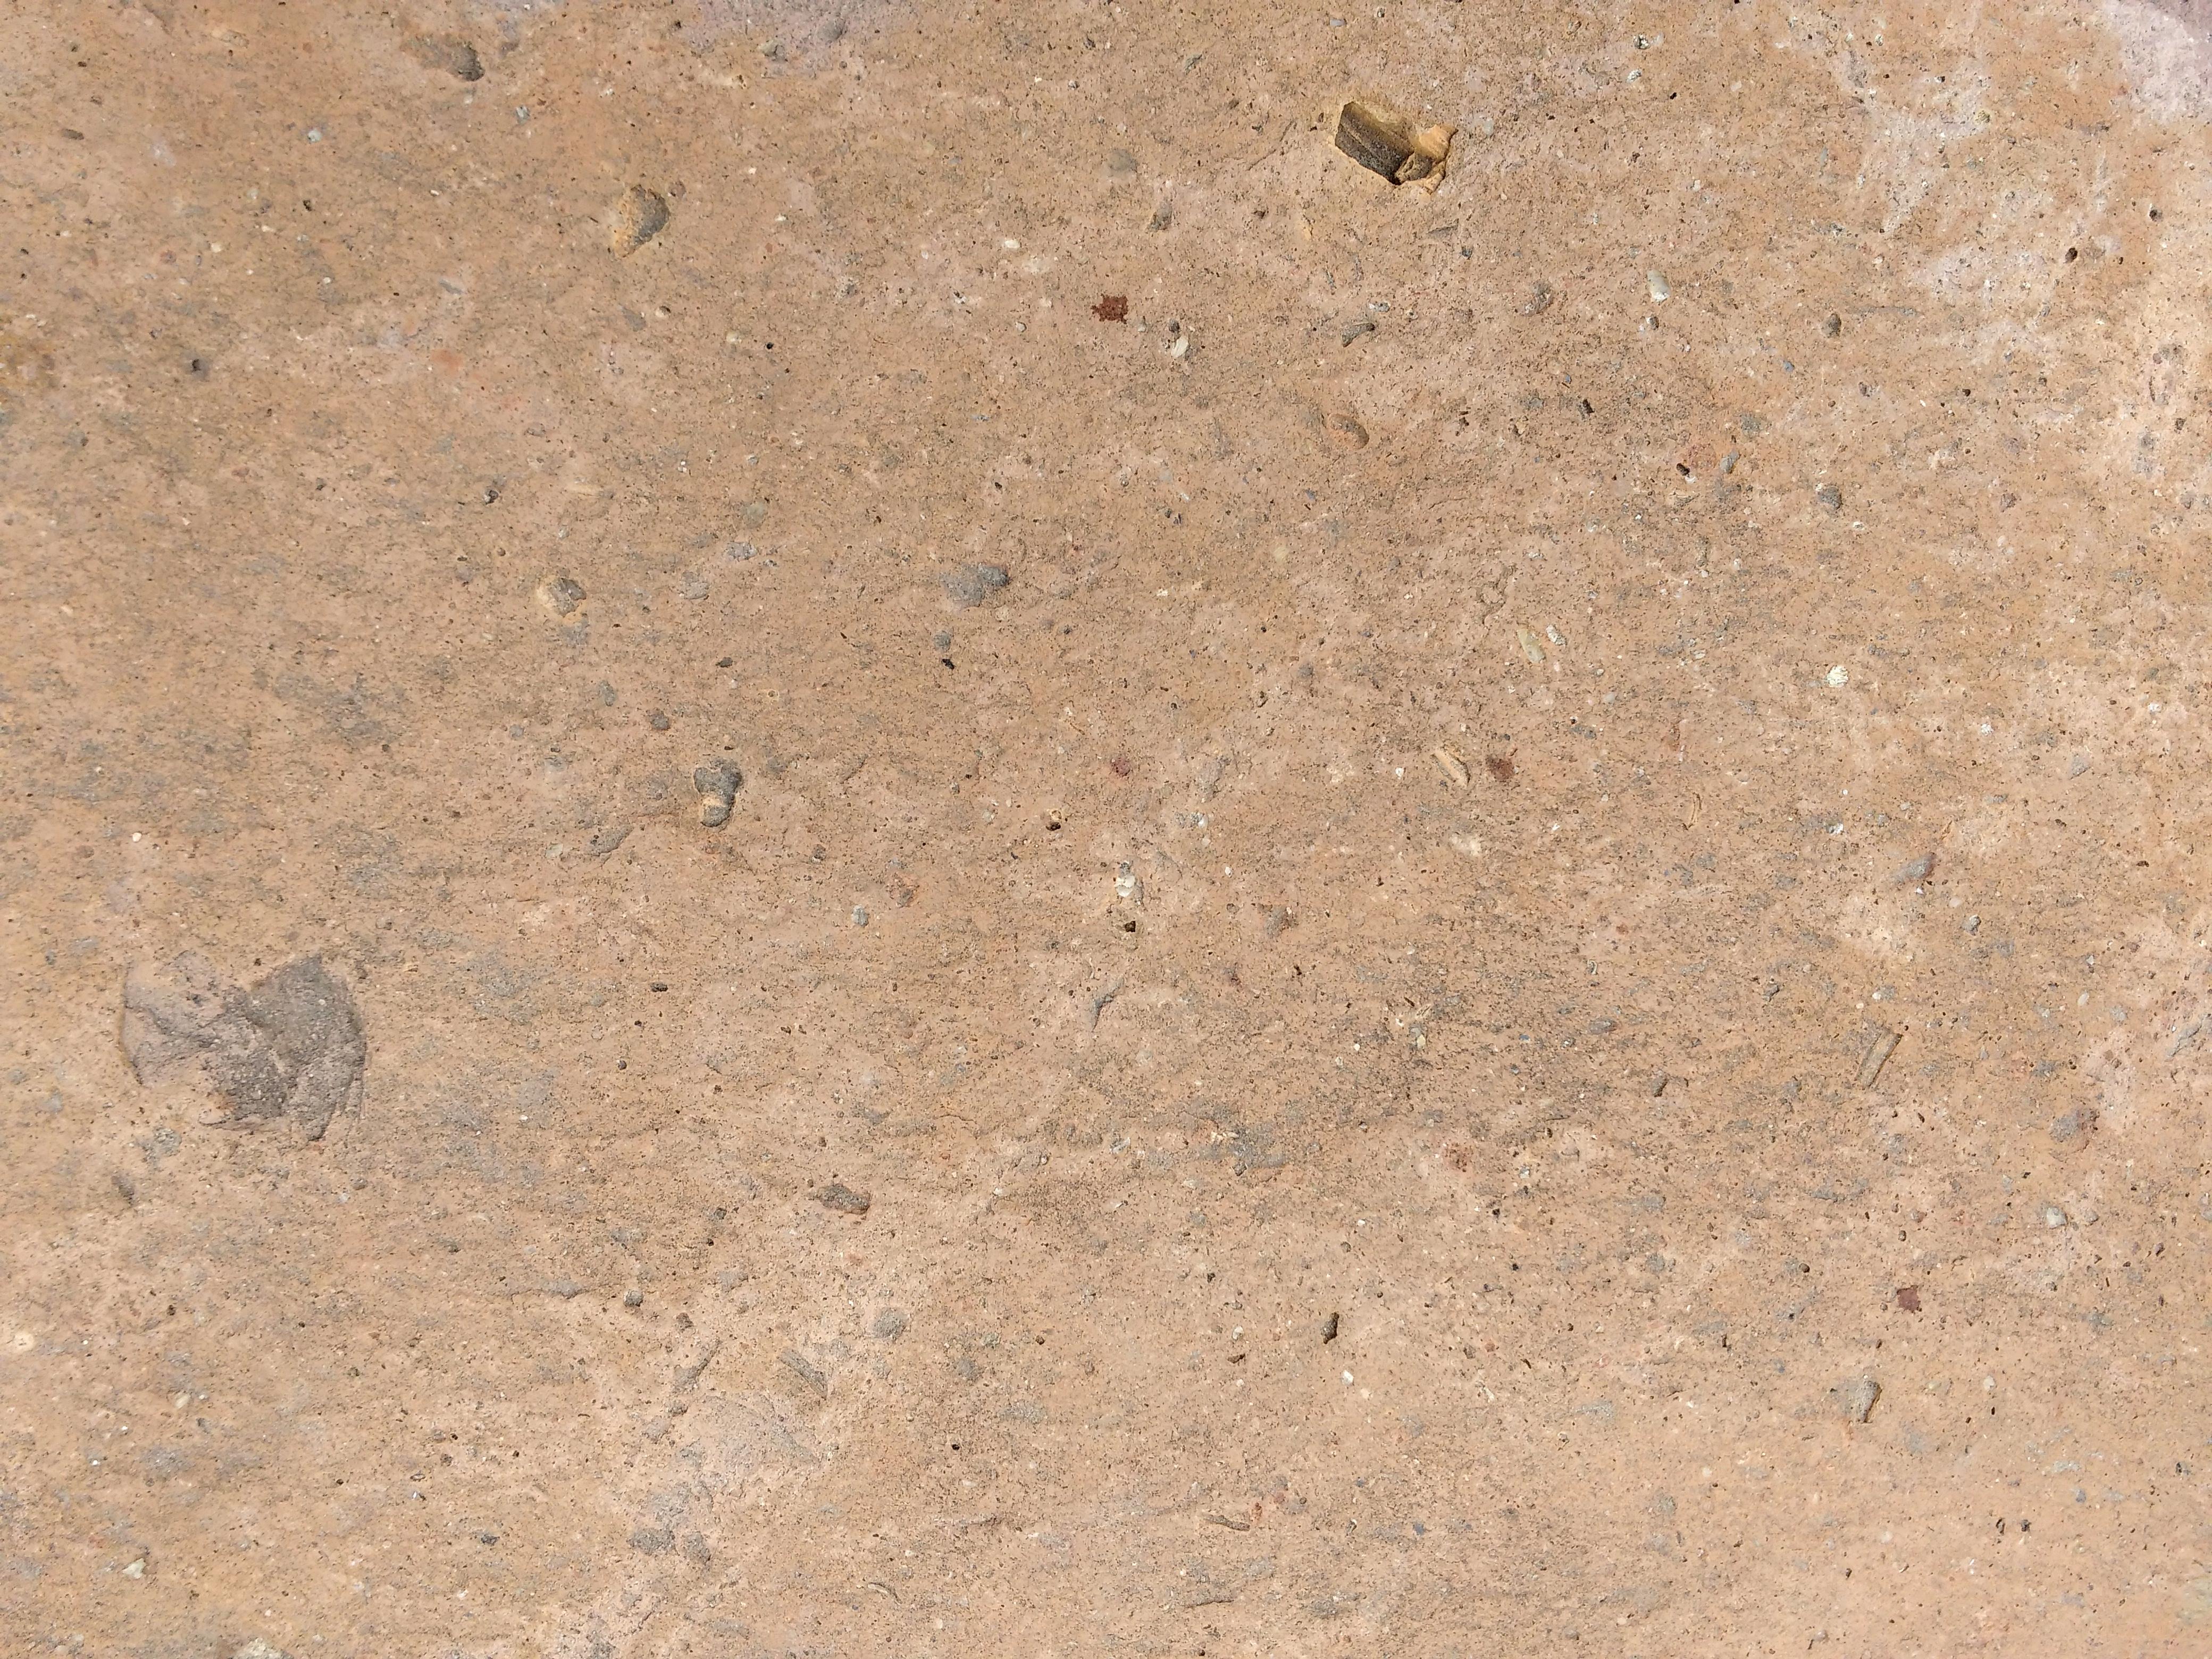 Tan Sandstone Texture Picture Free Photograph Photos